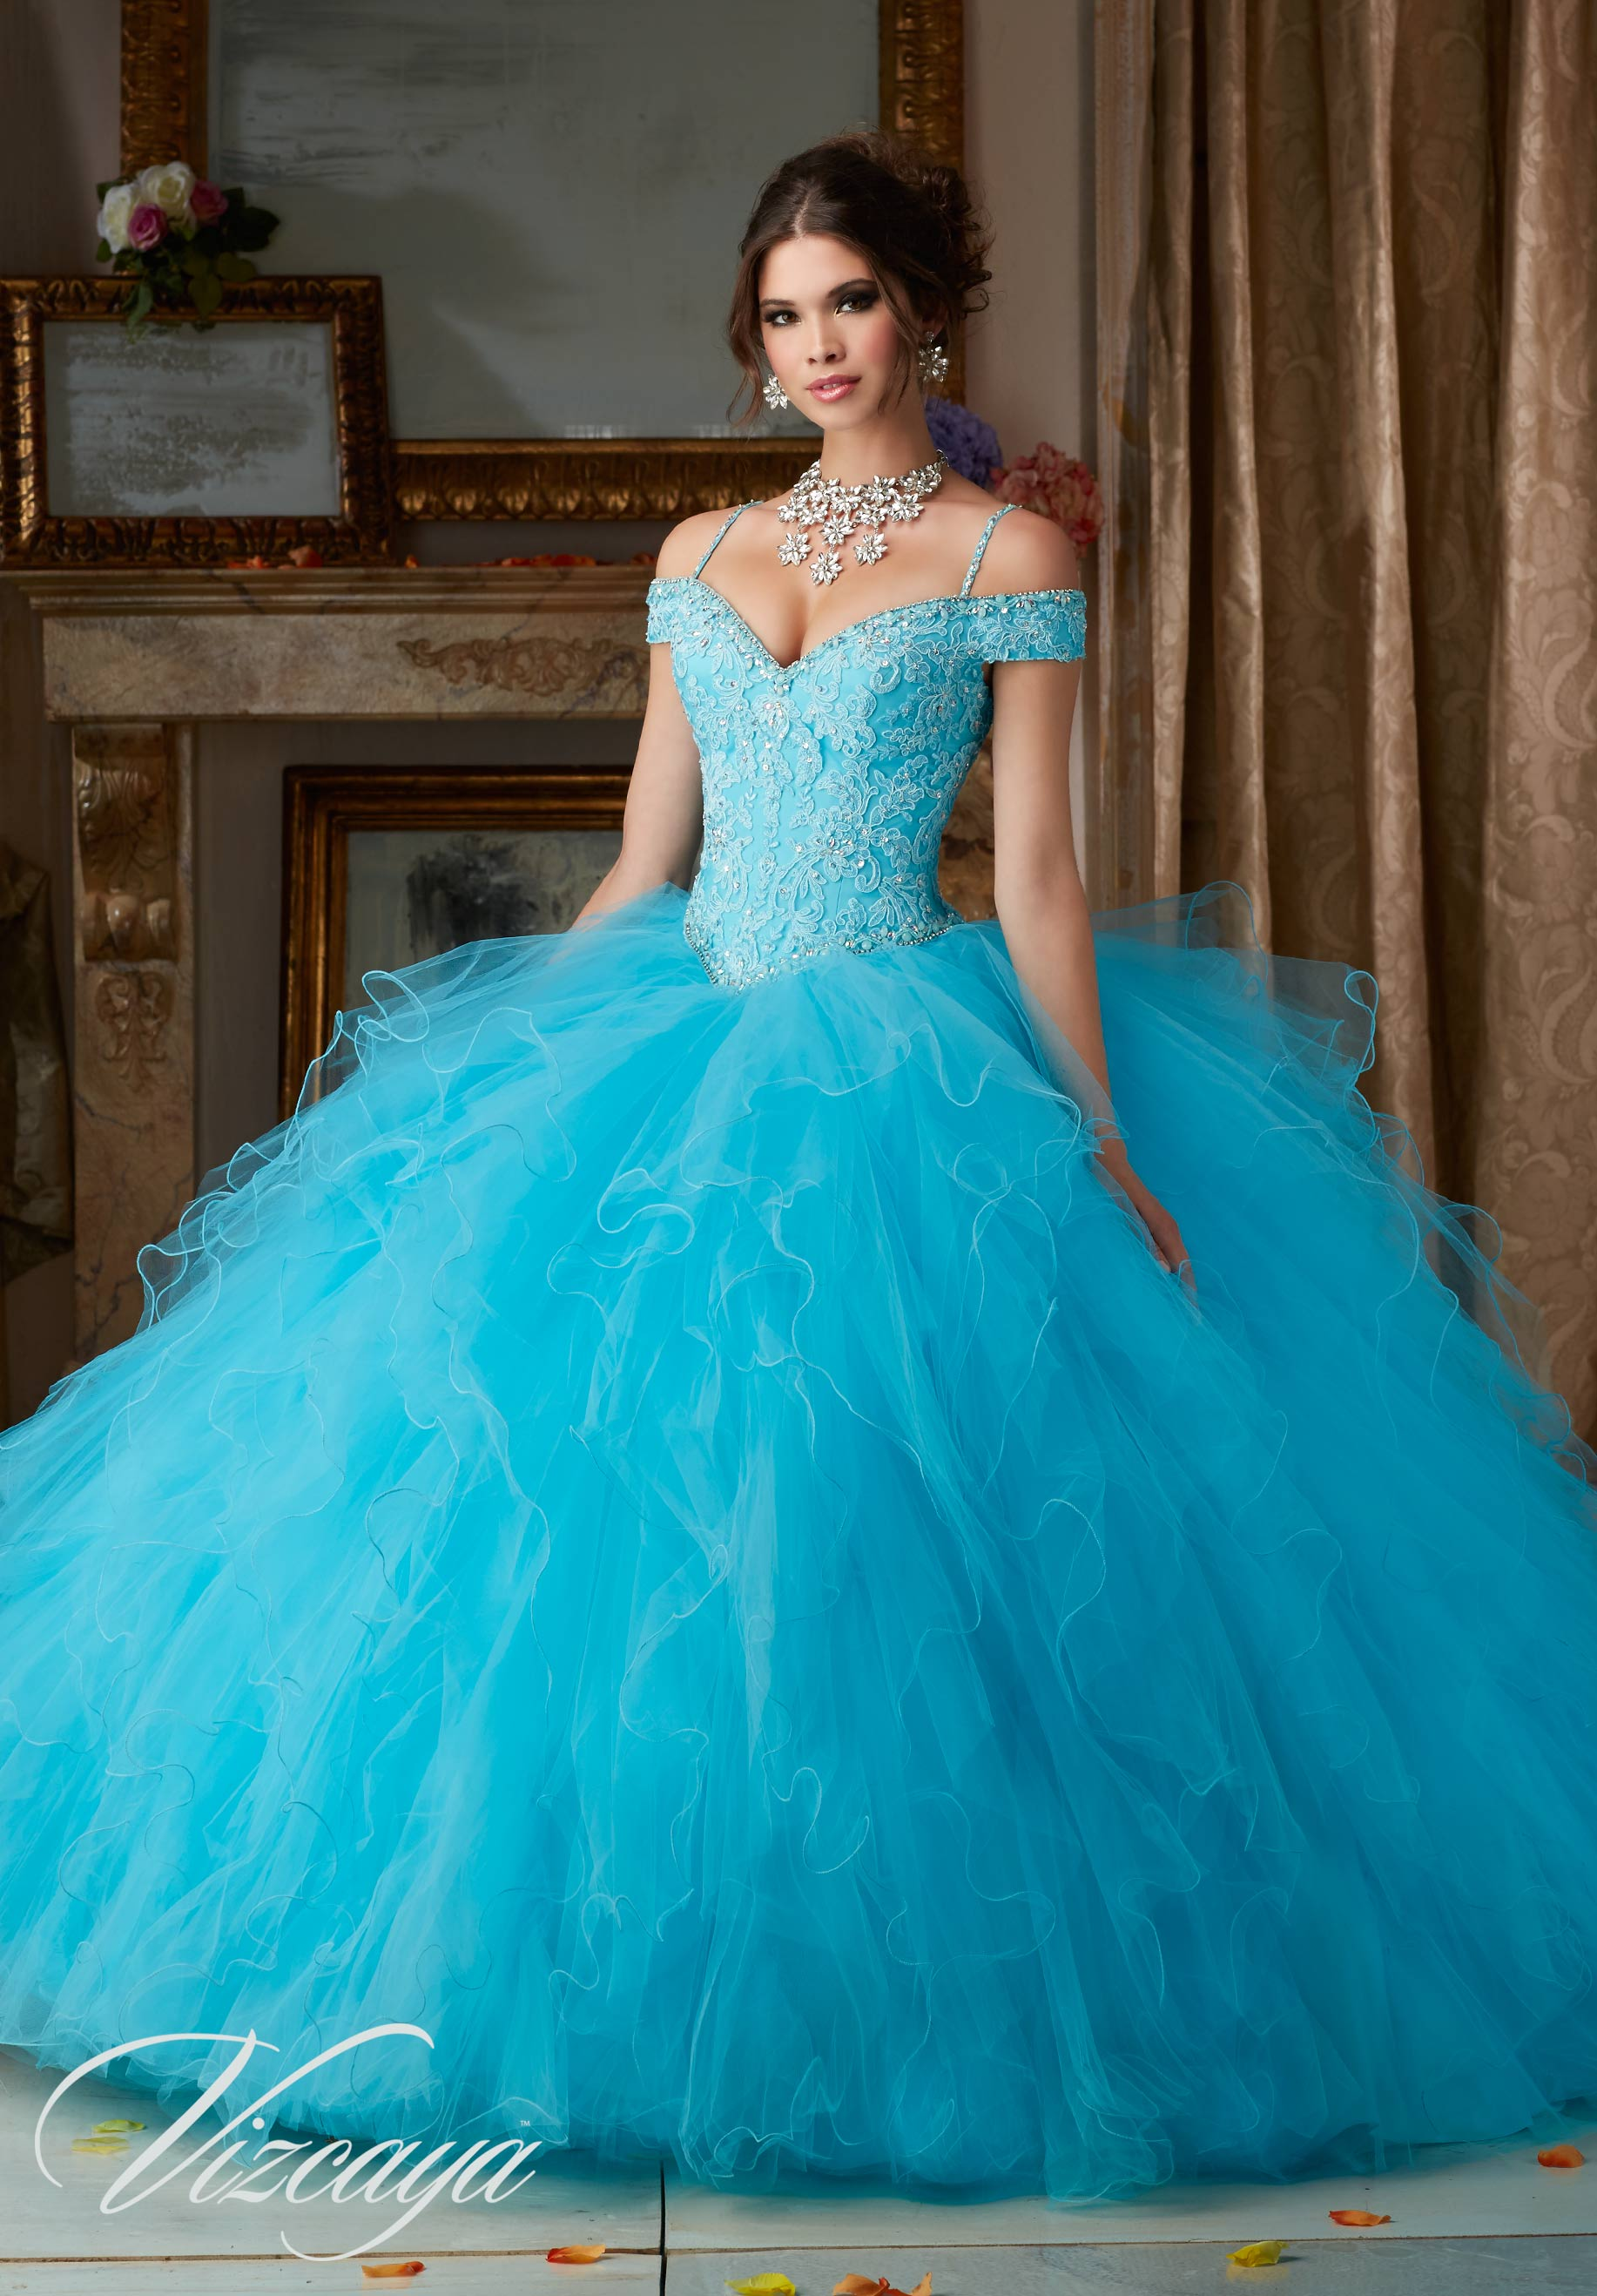 Prom Dresses In San Antonio - Eligent Prom Dresses